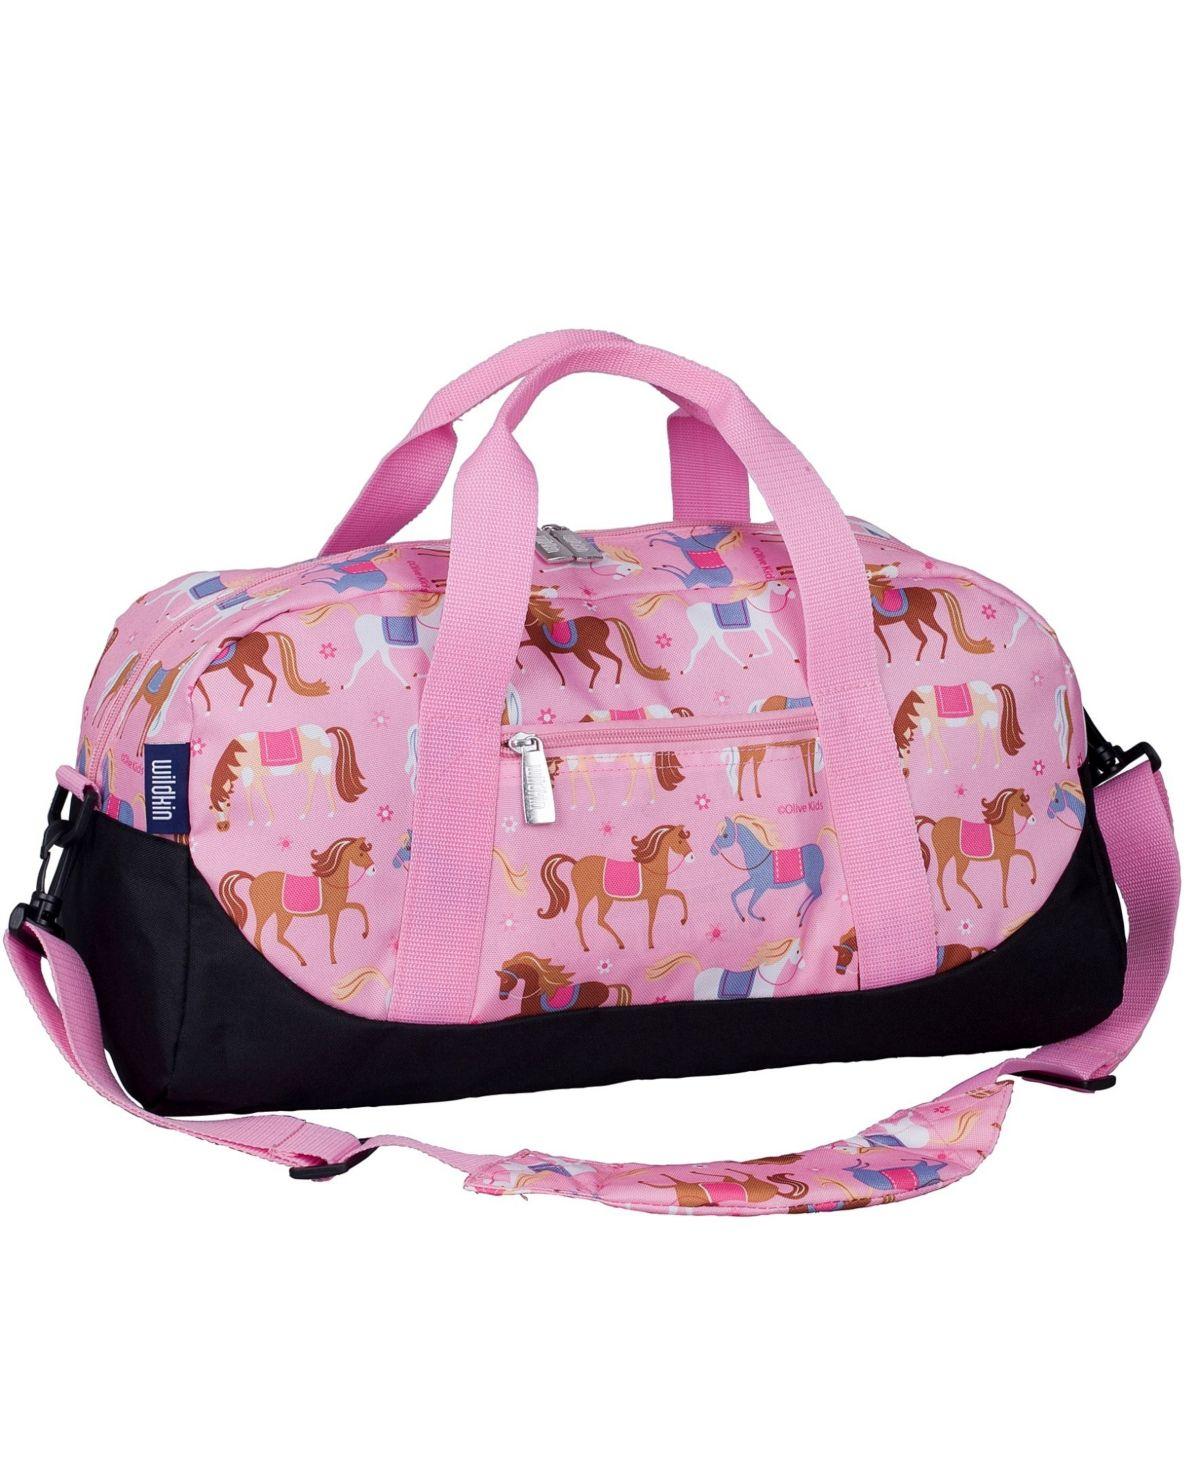 School Pattern Printed Canvas Duffle Luggage Travel Bag WAS/_42